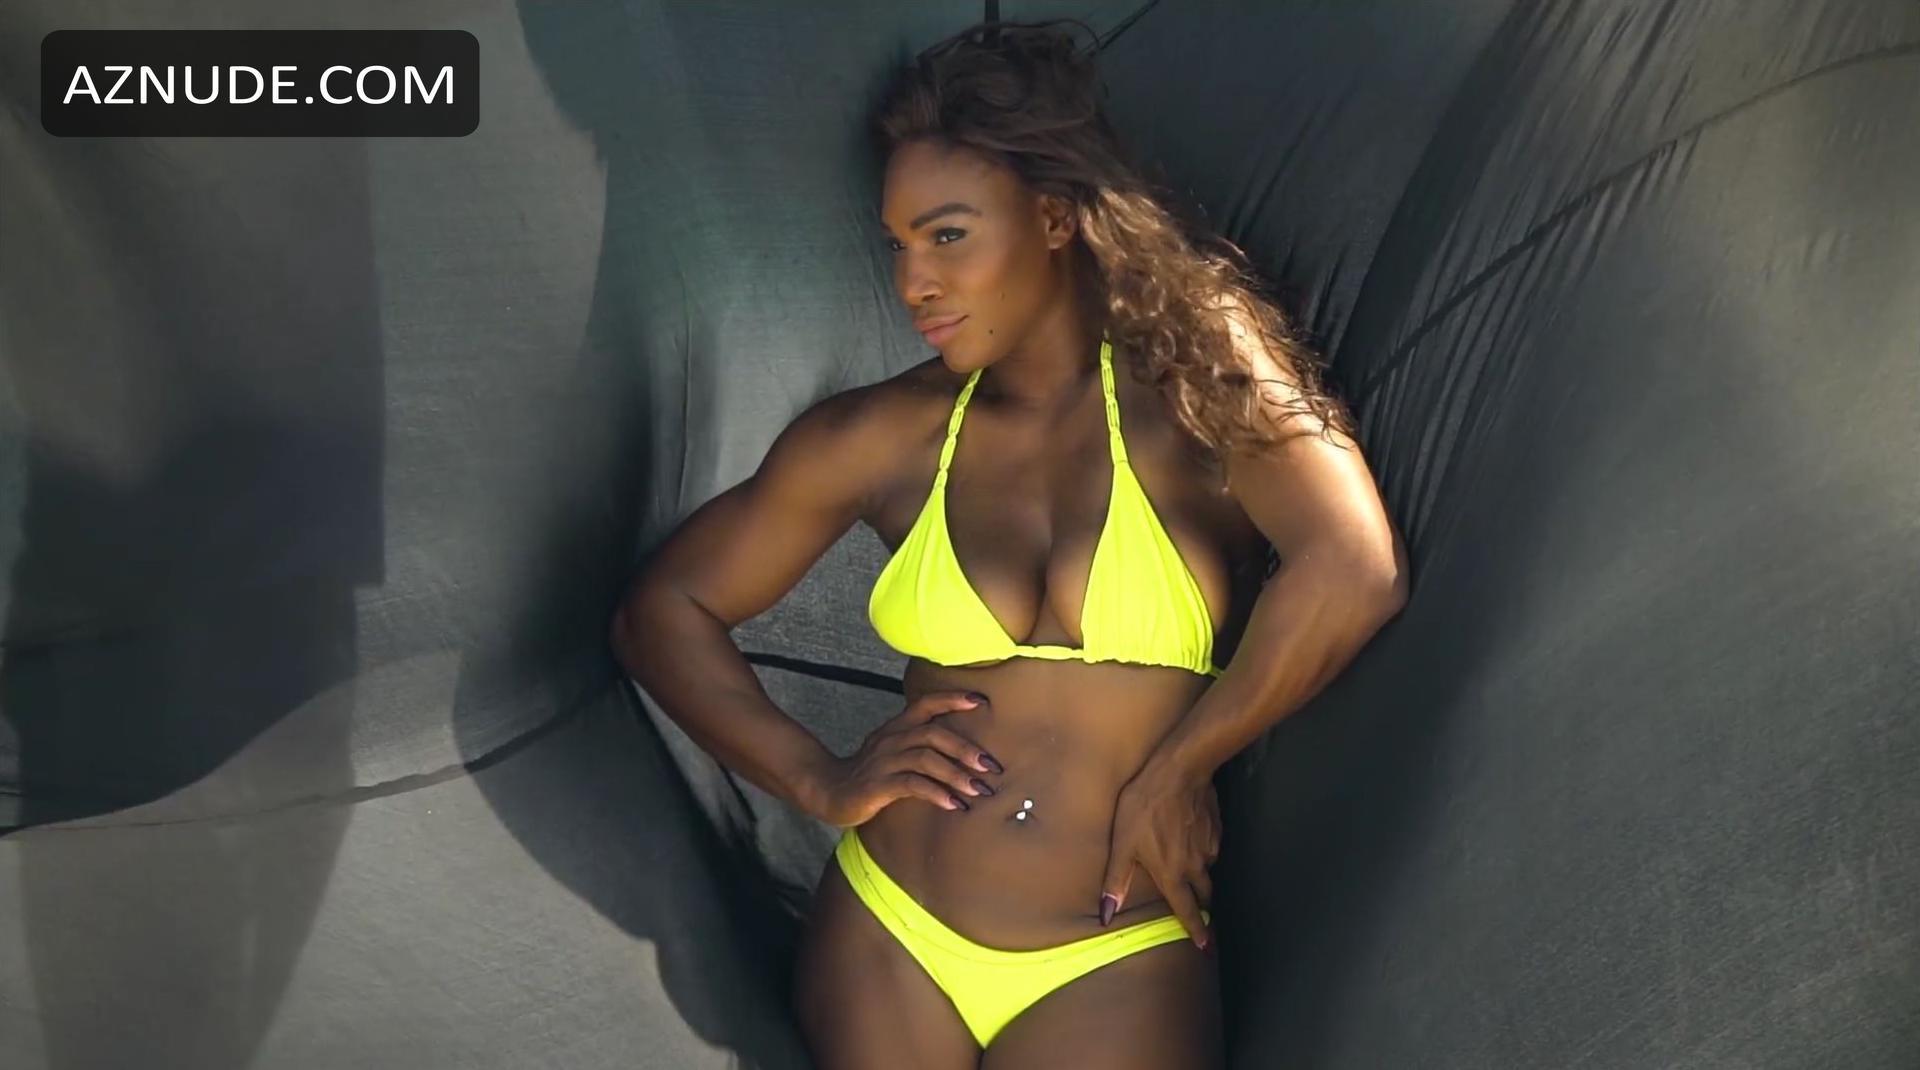 image Serena williams sport illustrated swimsuit 2017